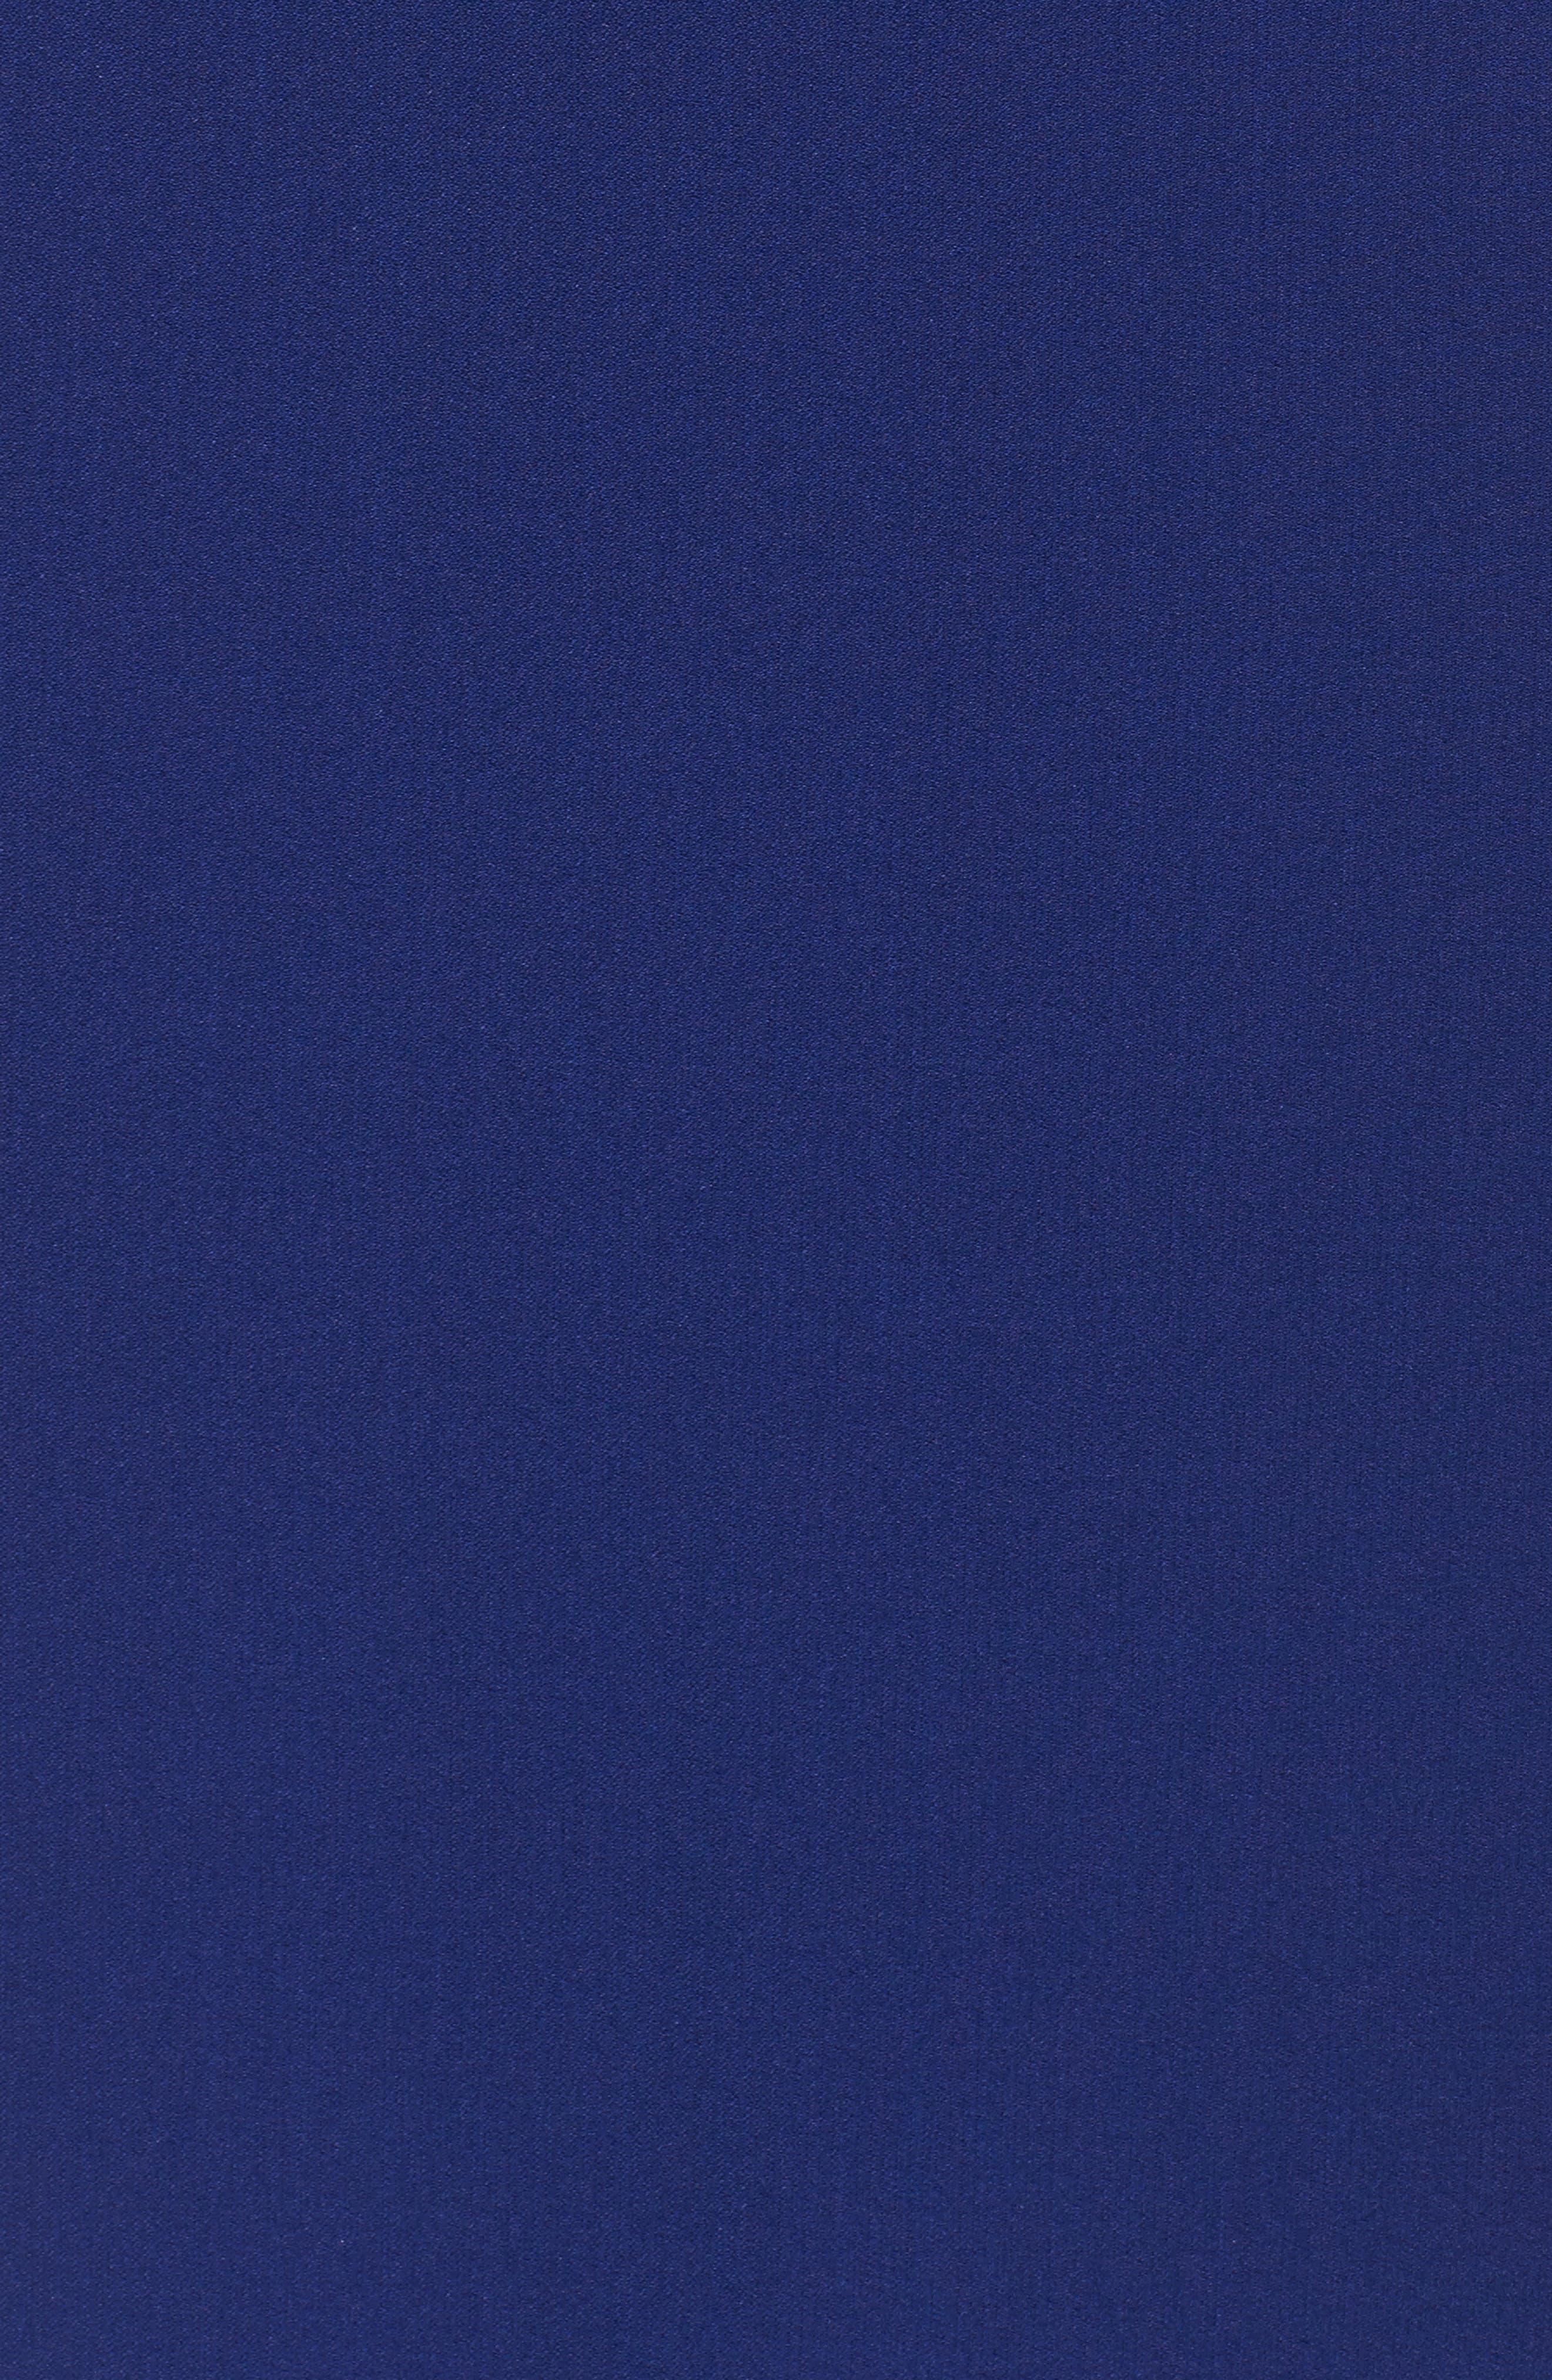 Crepe Sheath Dress,                             Alternate thumbnail 5, color,                             401